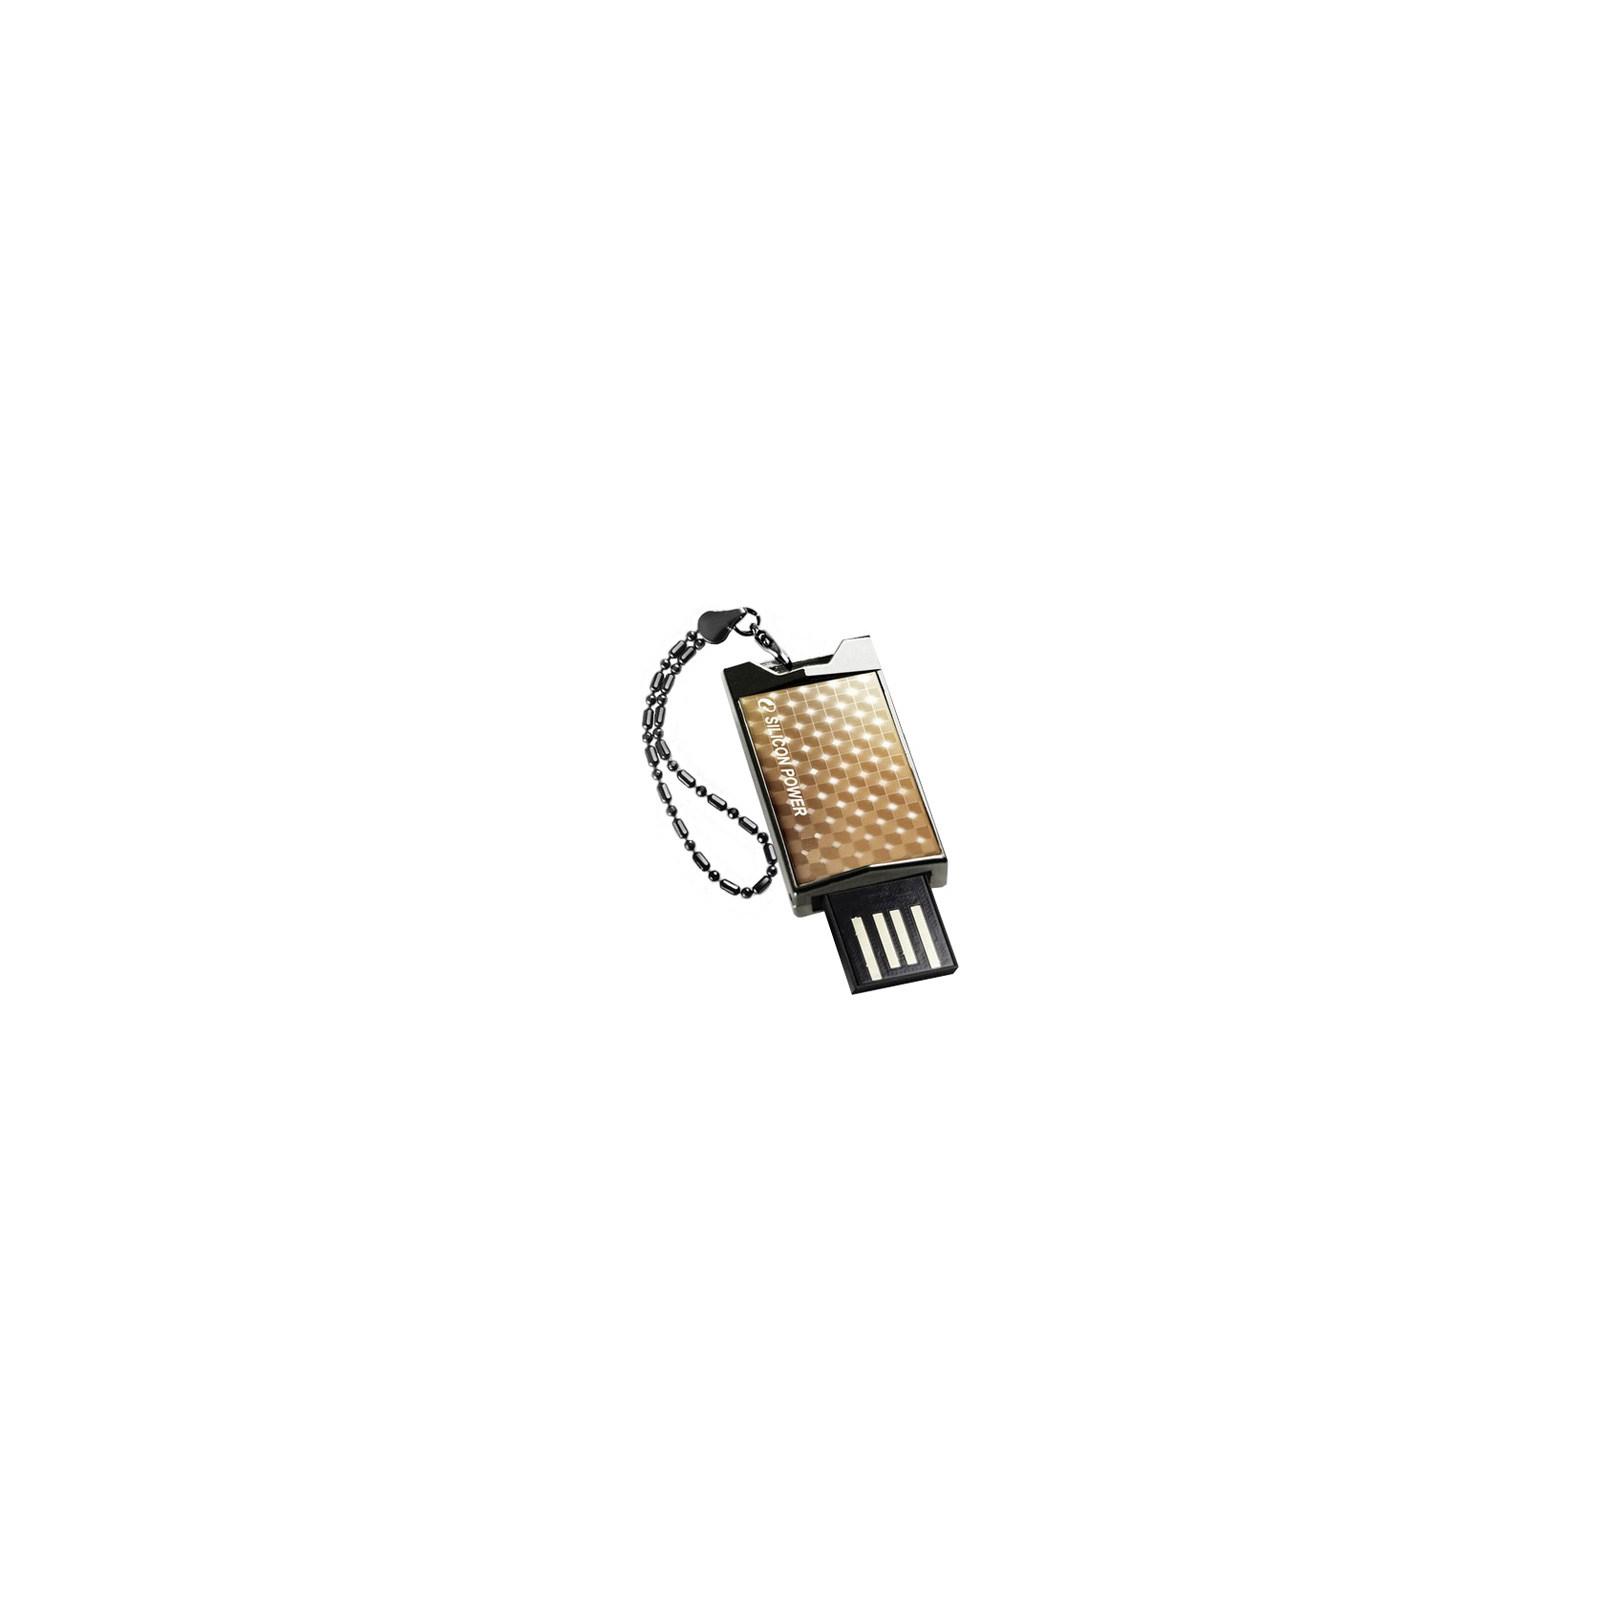 USB флеш накопитель 4Gb 851 gold Silicon Power (SP004GBUF2851V1G)